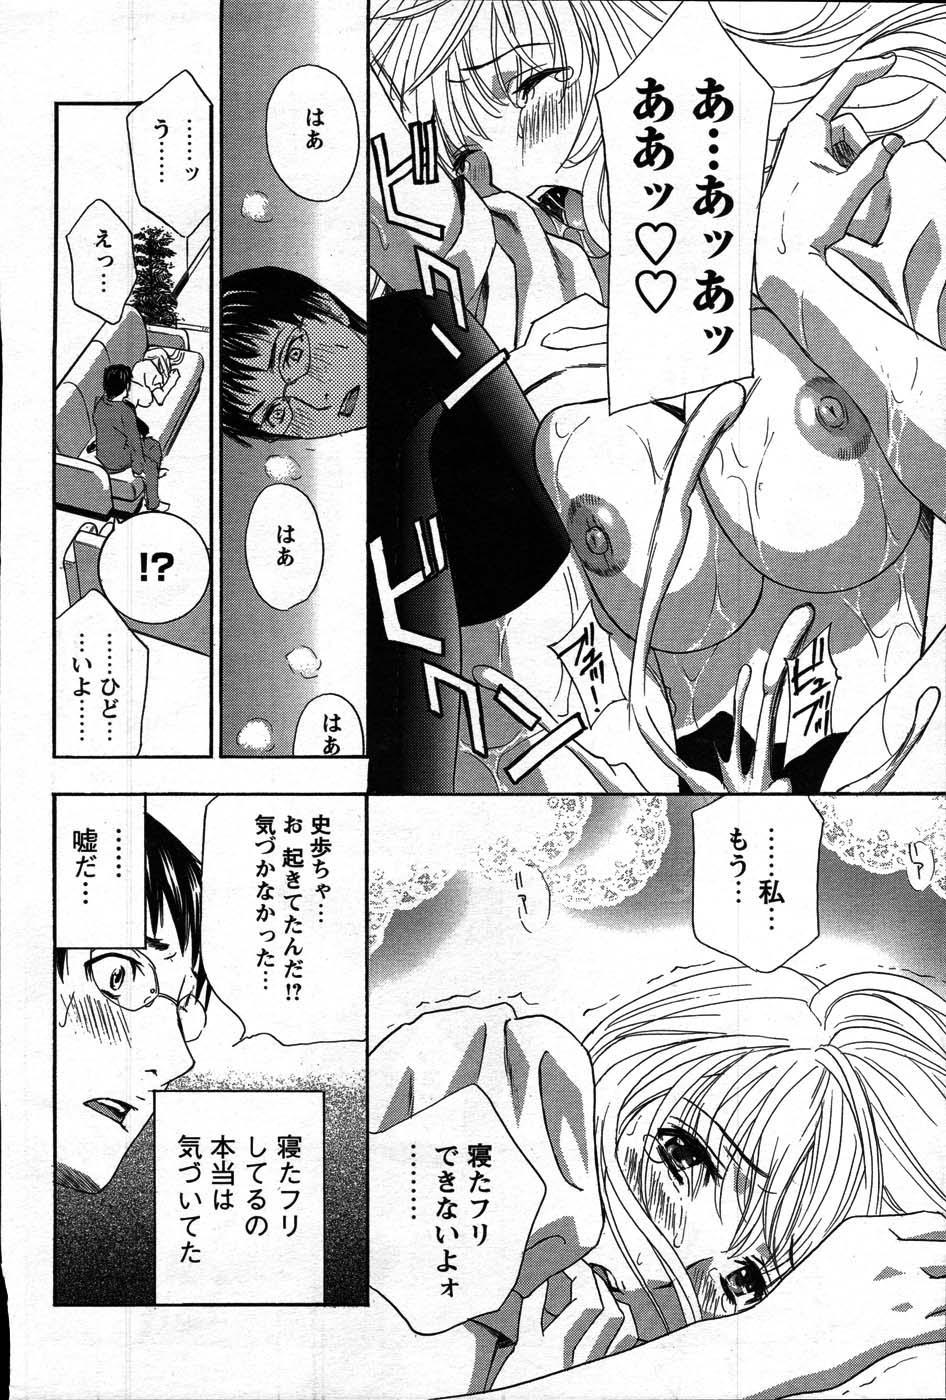 Comic Mens Young Special IKAZUCHI vol. 2 19